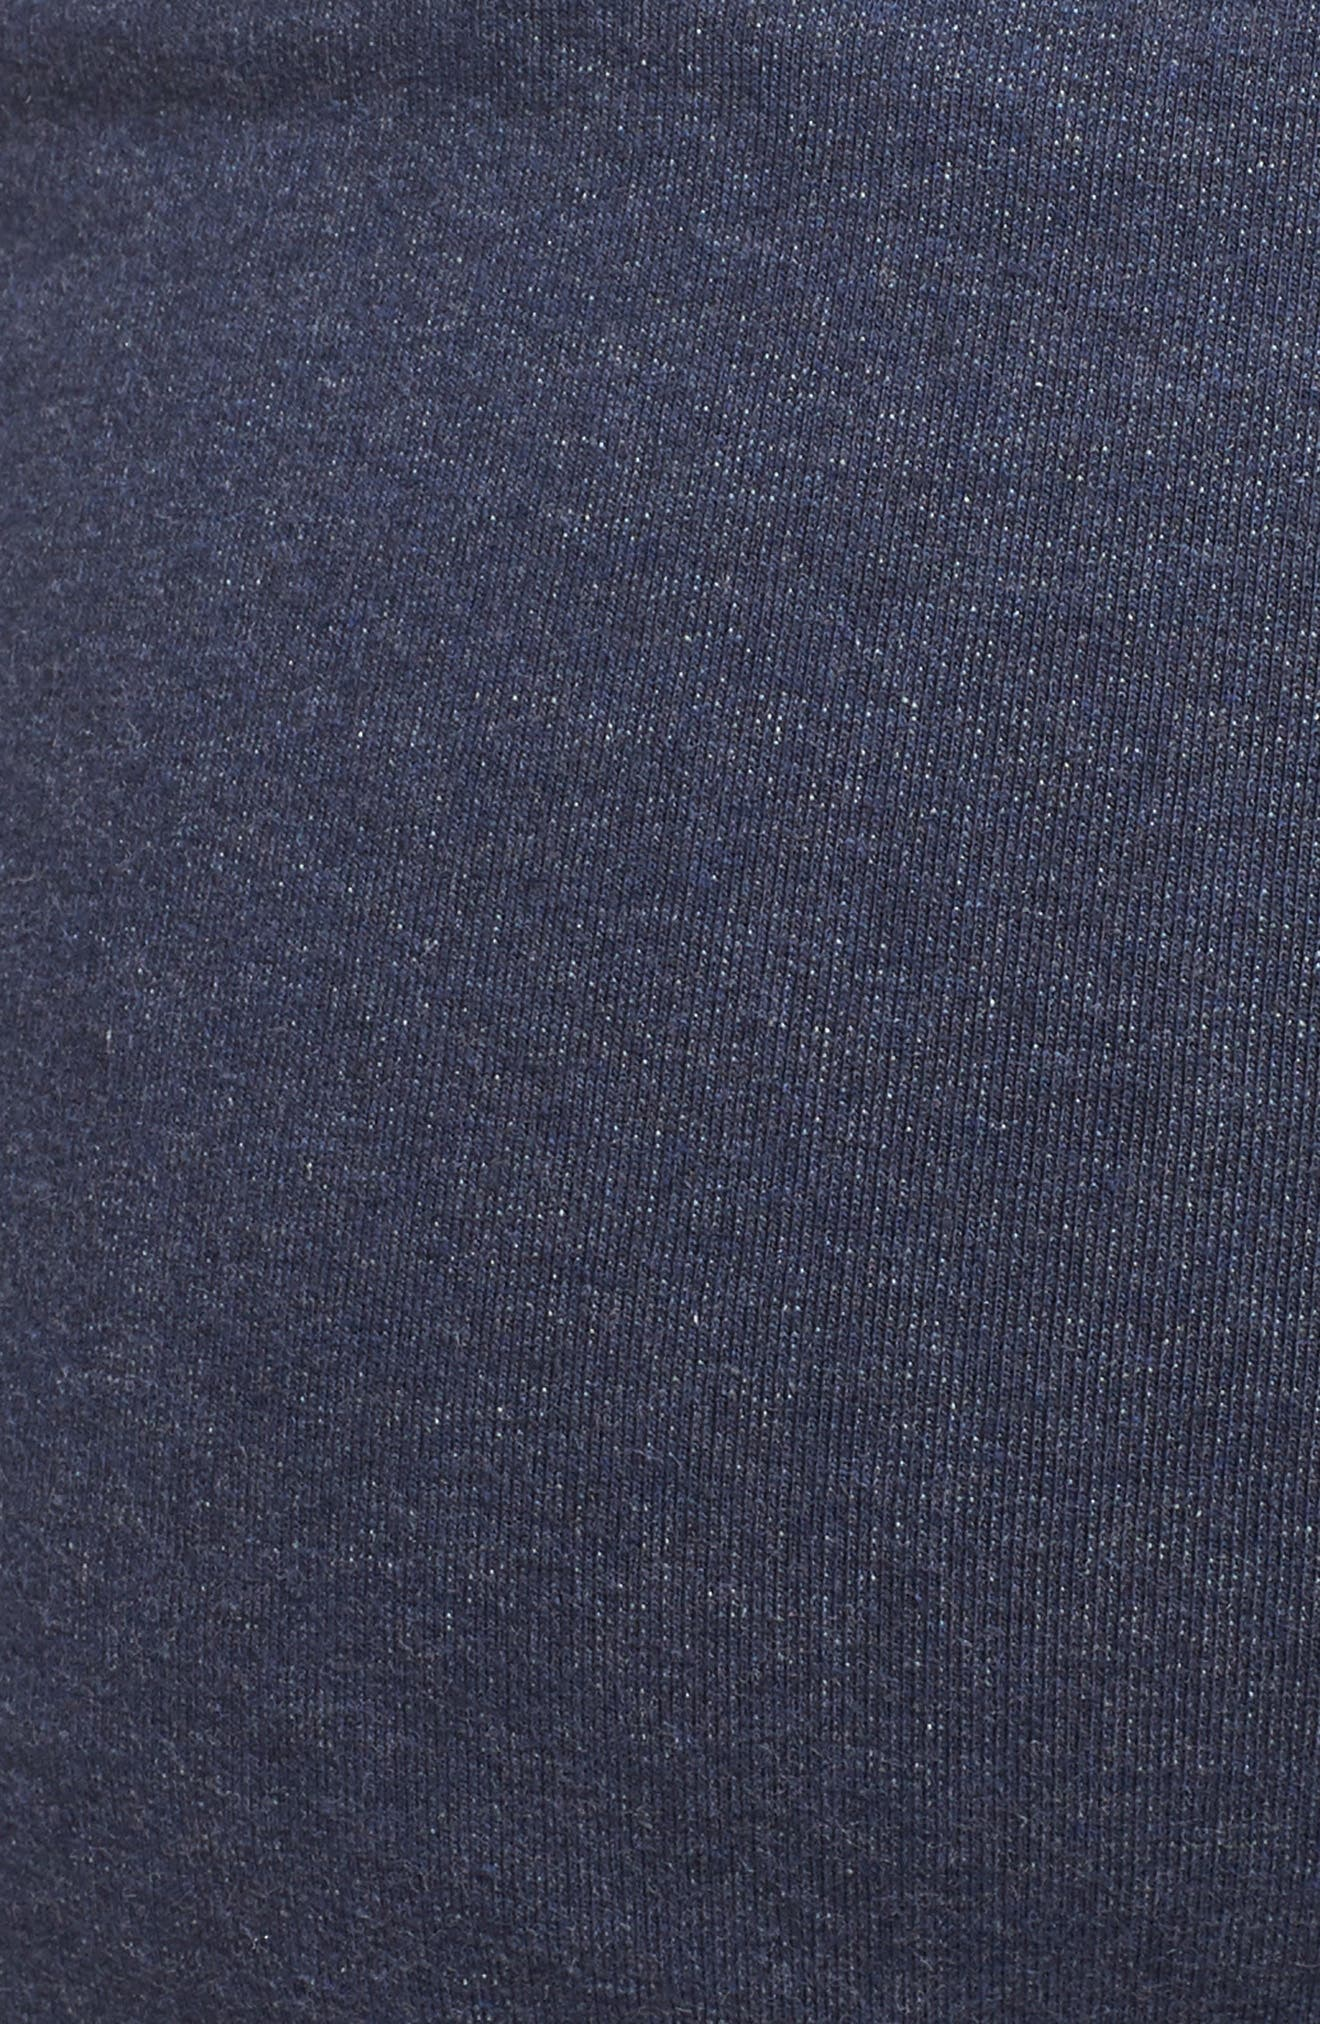 M's Mahnya Fleece Jogger Pants,                             Alternate thumbnail 5, color,                             Navy Blue